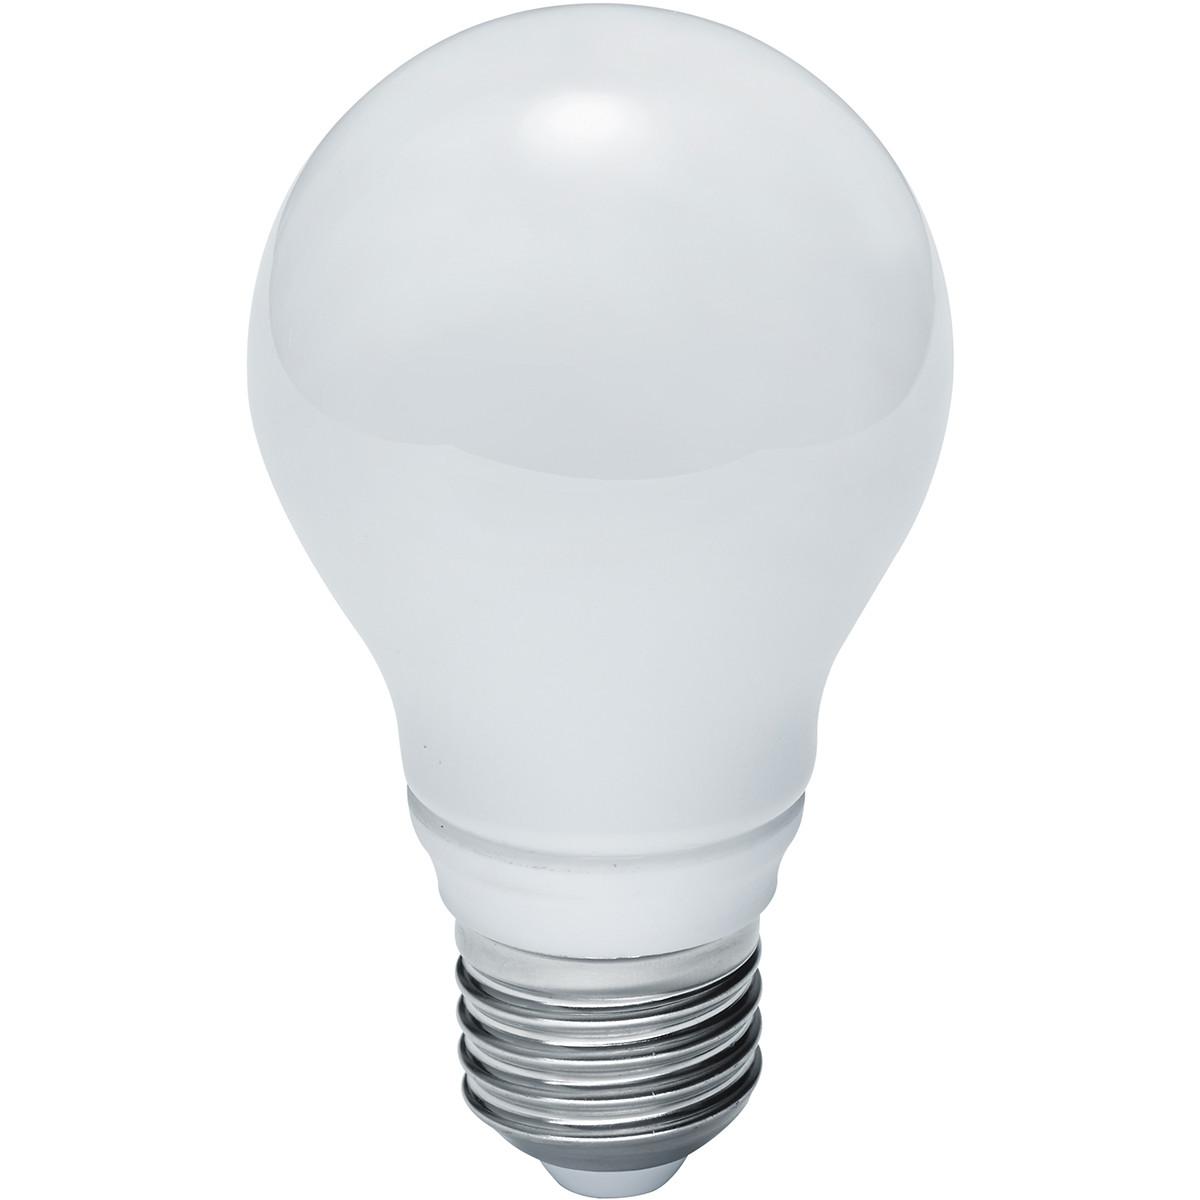 LED Lamp WiZ - Smart LED - Trion Akusti - E27 Fitting - 8W - Slimme LED - Dimbaar - Mat Wit - Kunsts